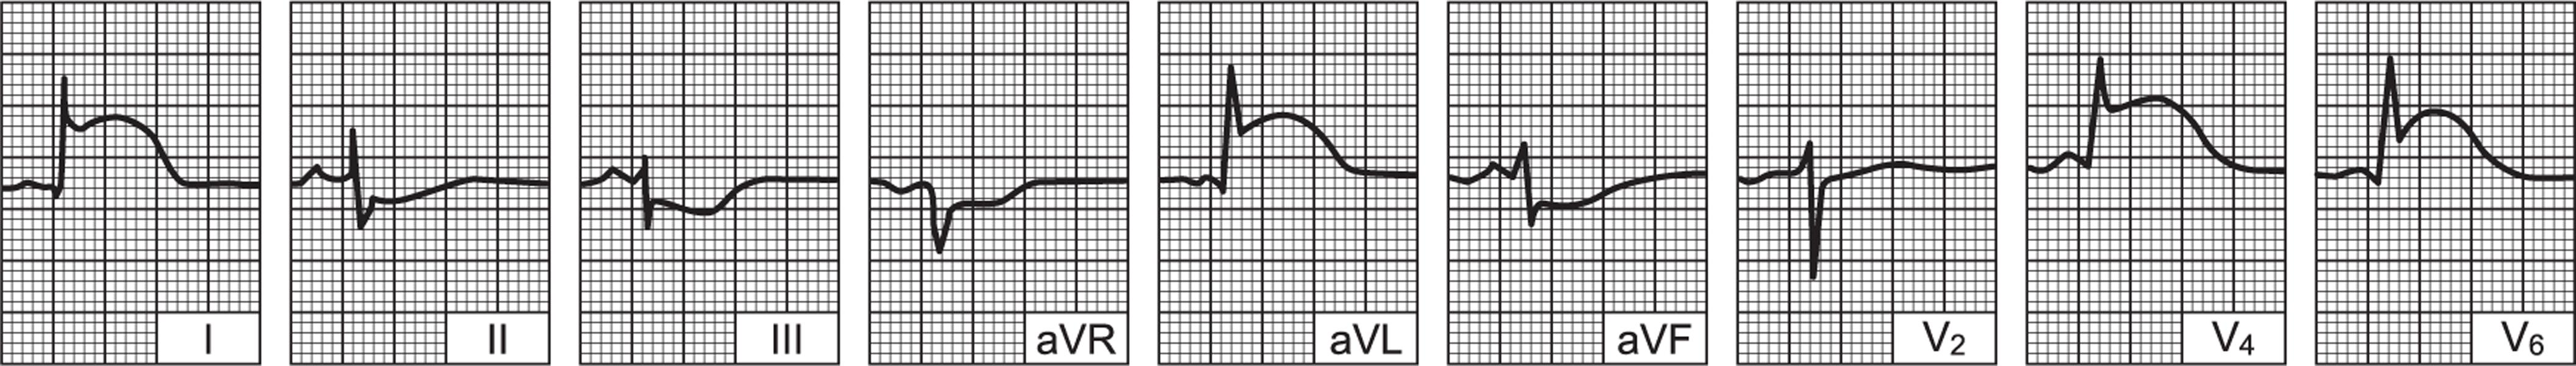 hipertenzija aritmije infarkta